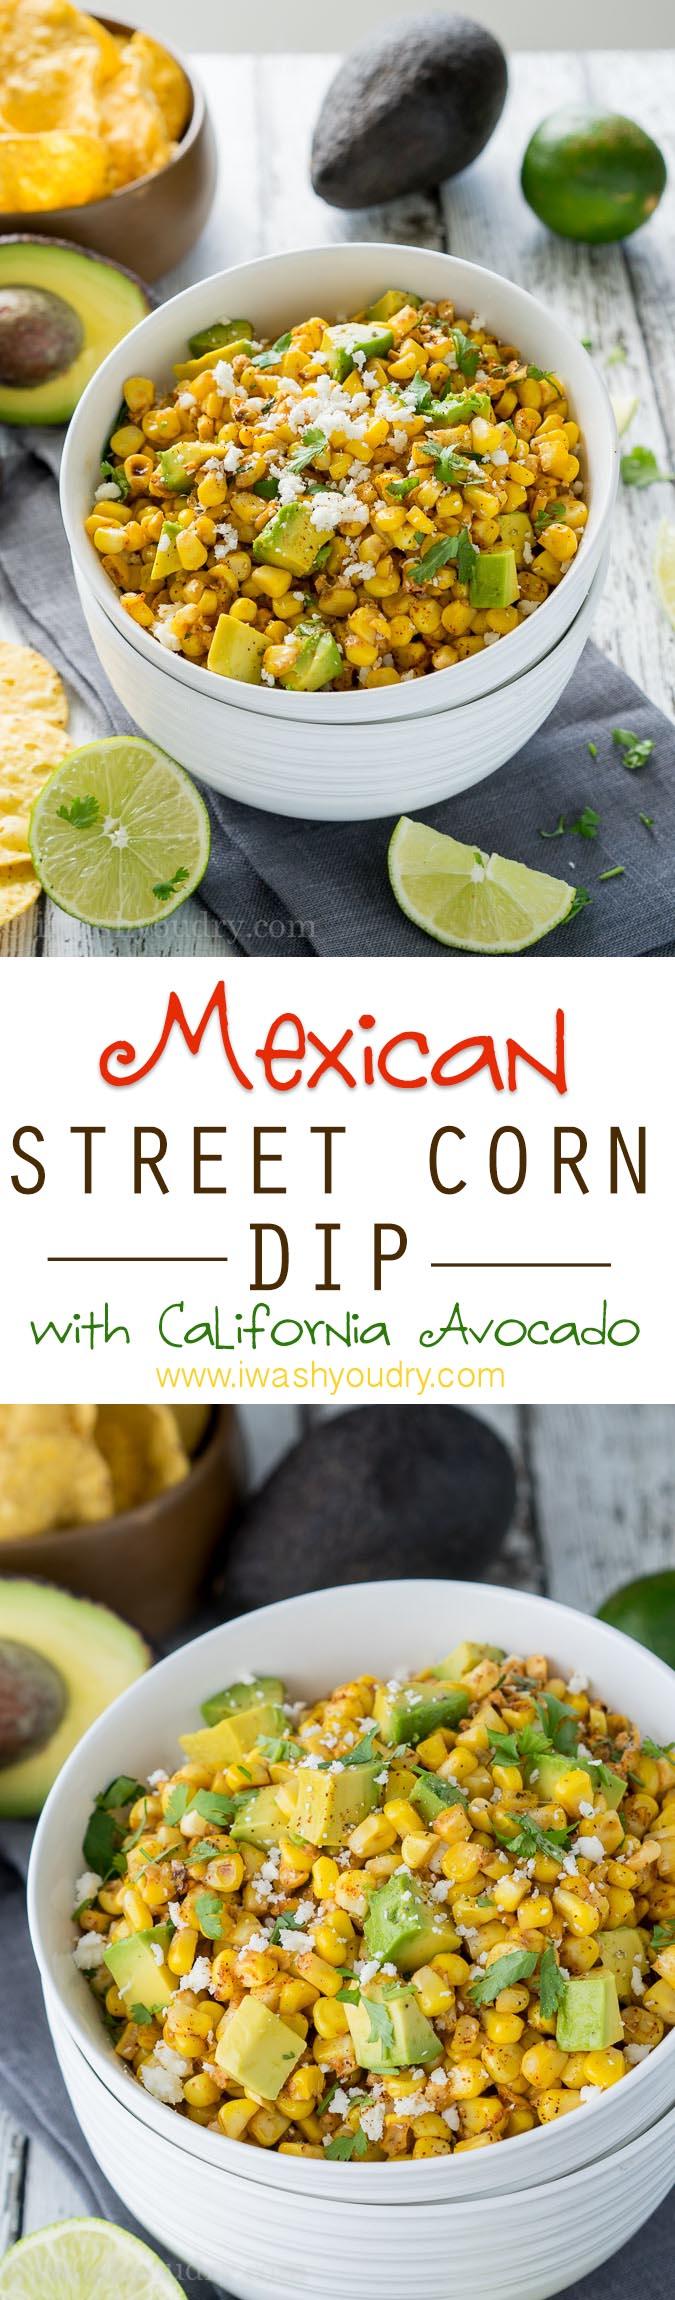 Quick and easy Mexican Street Corn Dip with creamy California Avocados! So good!